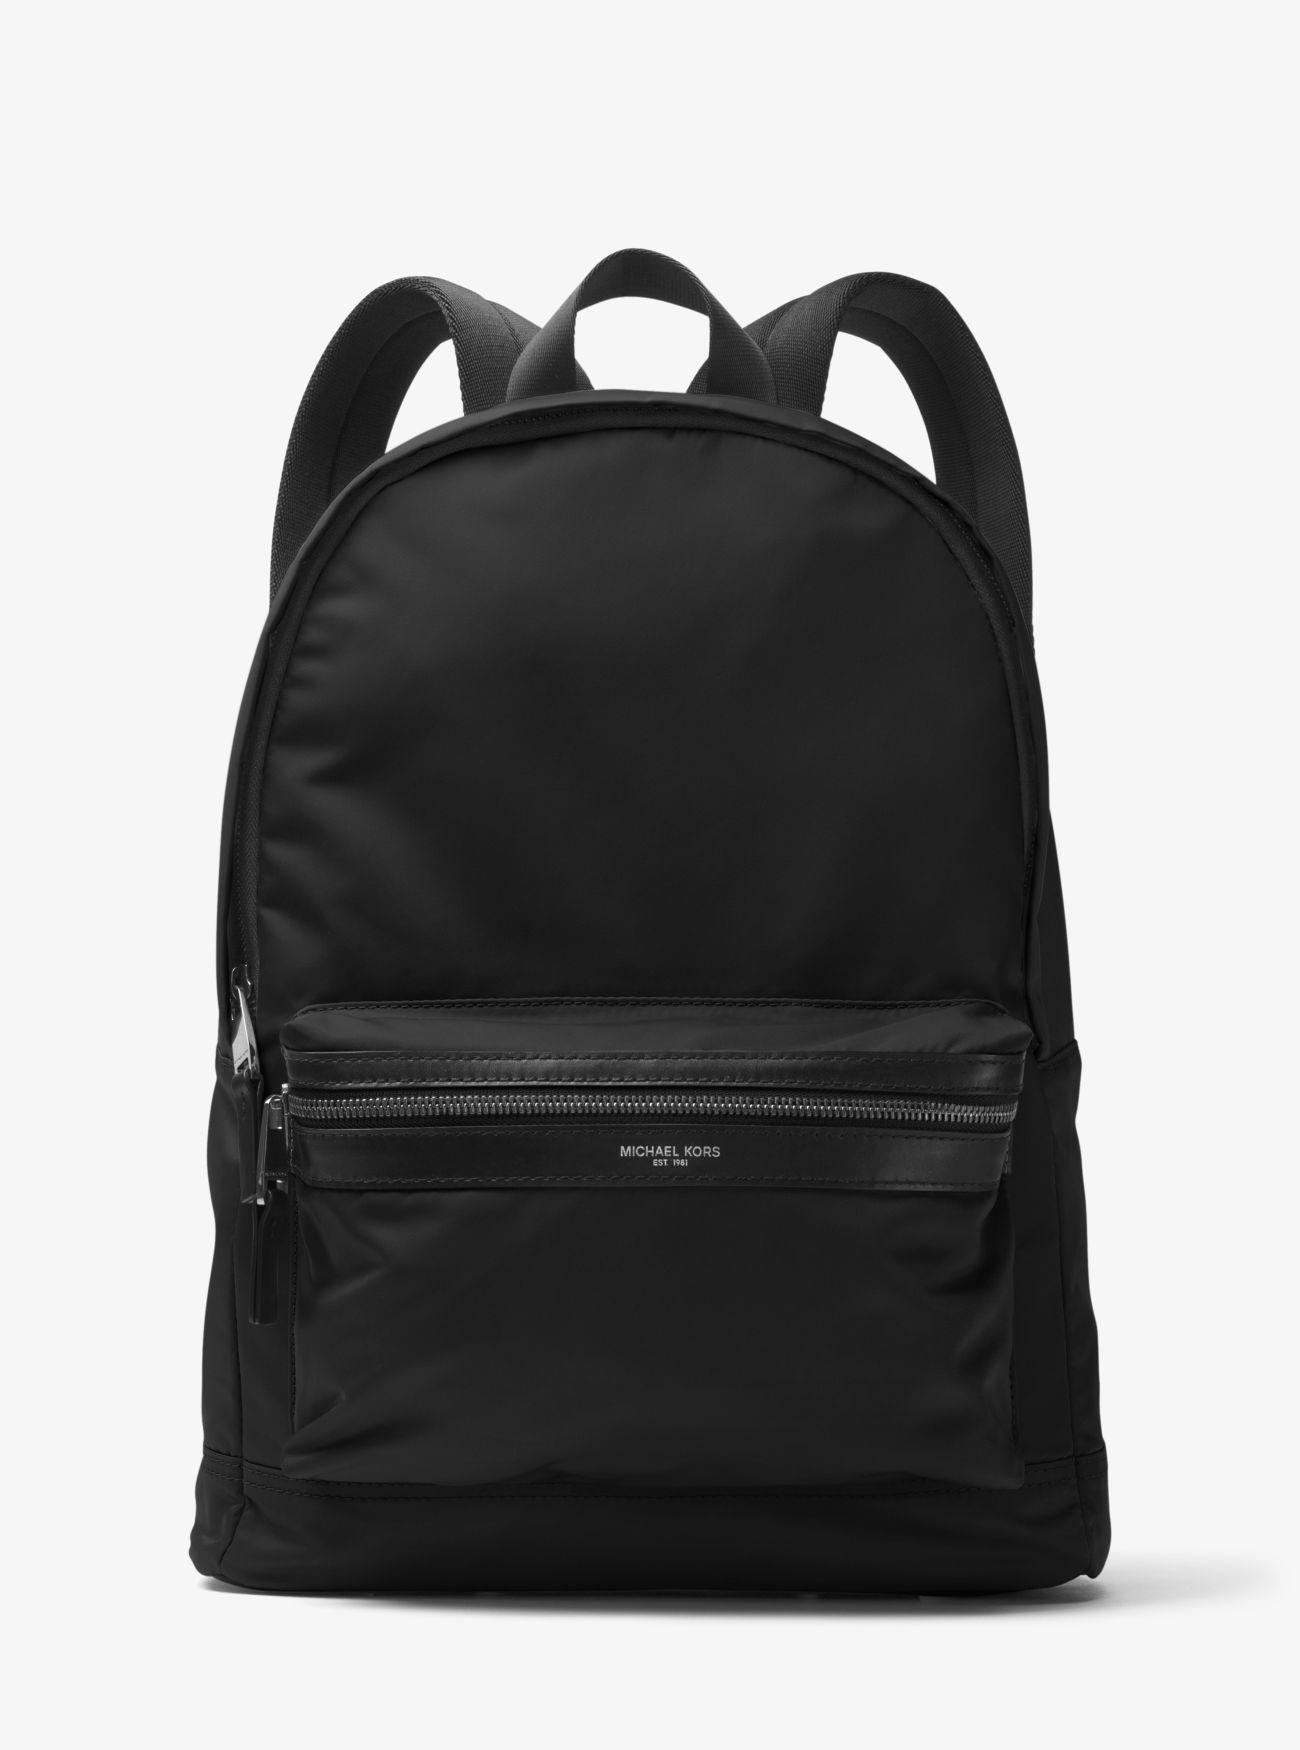 Bags: Men's Designer & Leather Briefcases | Michael Kors